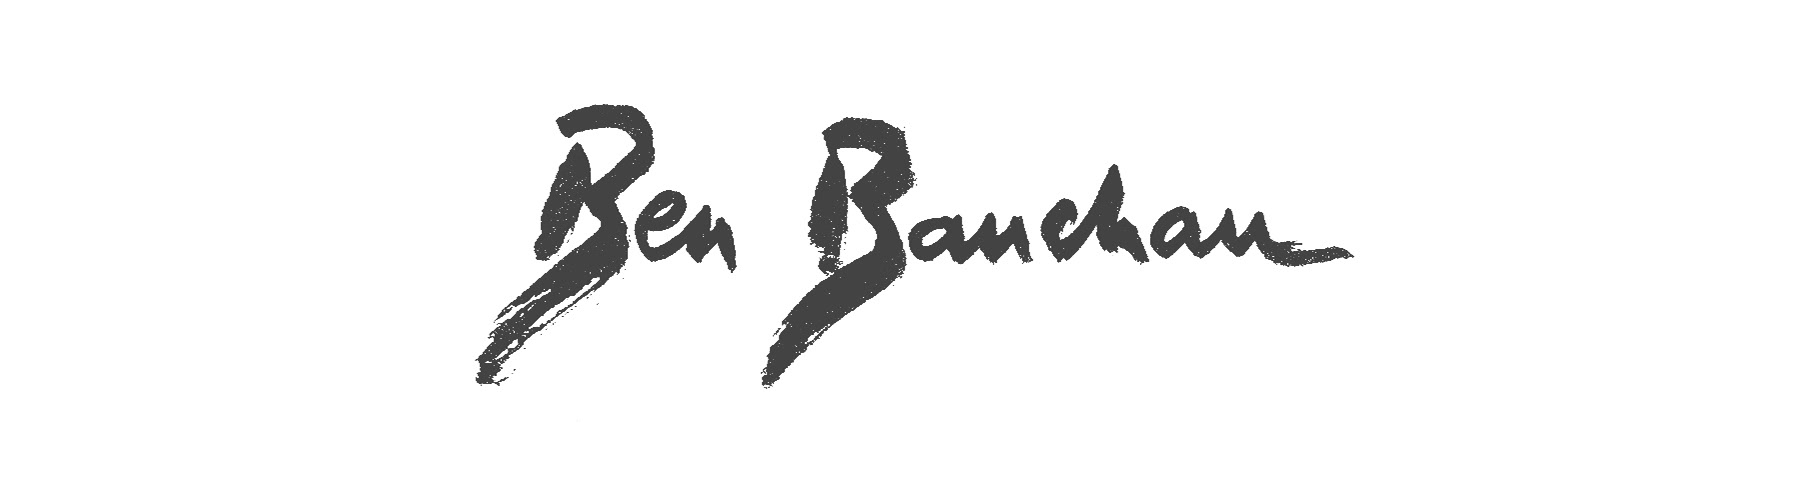 ben bauchau